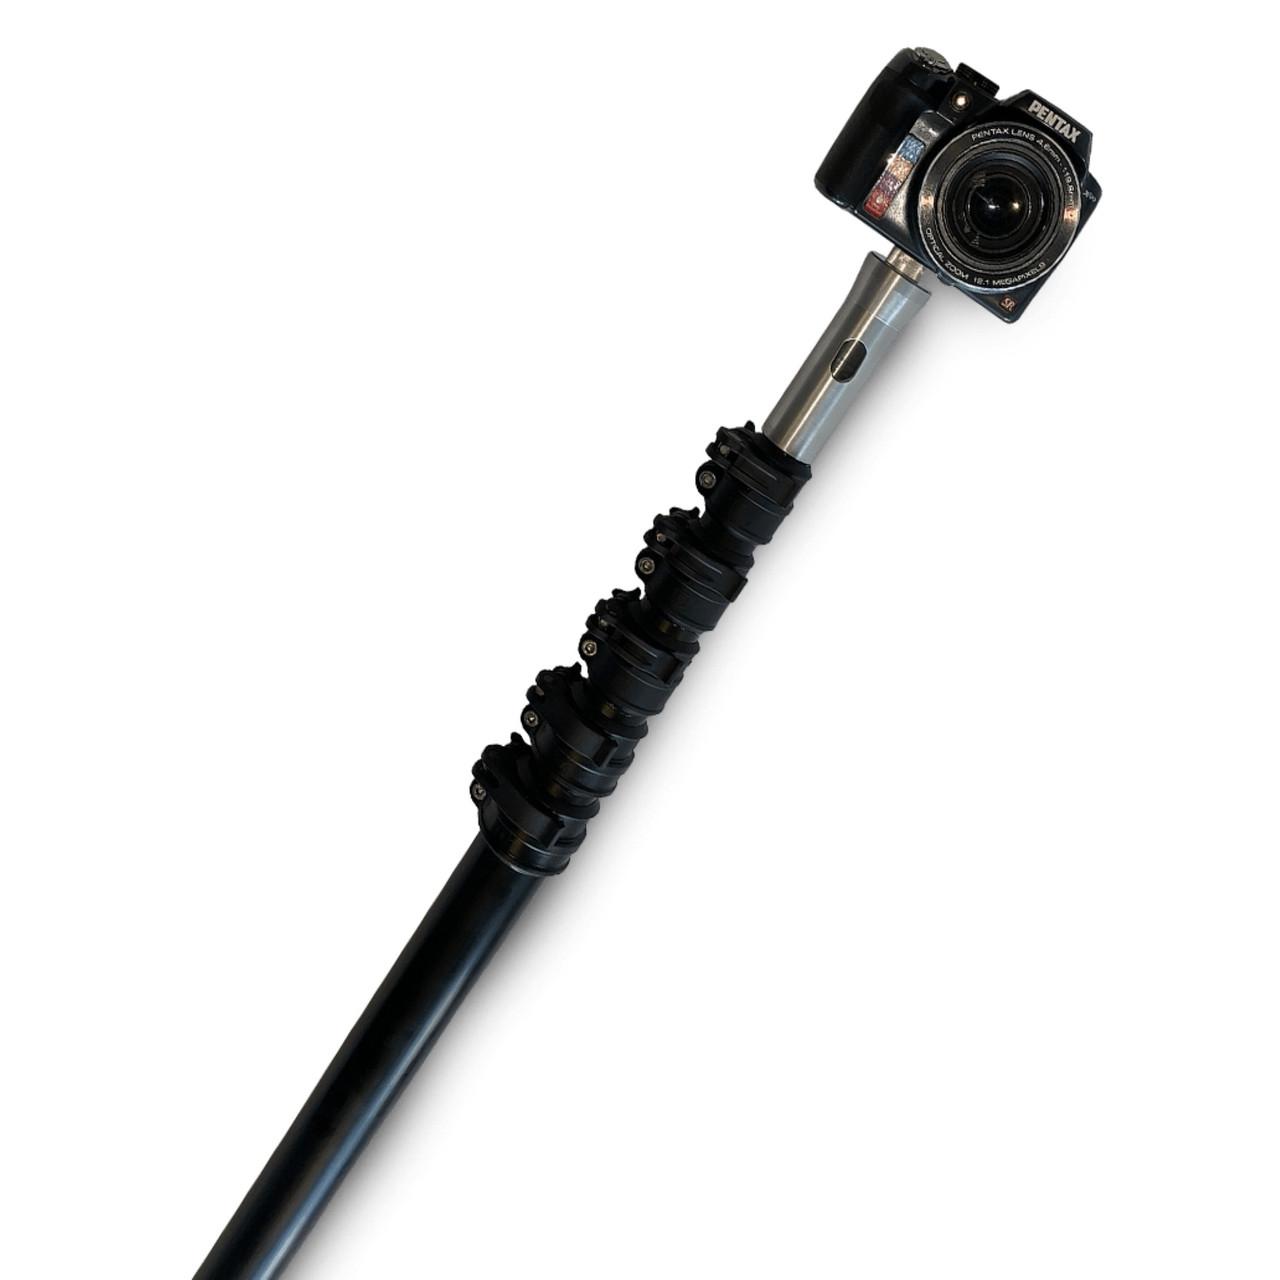 25ft Carbon Fibre Telescopic Monopod Camera Pole